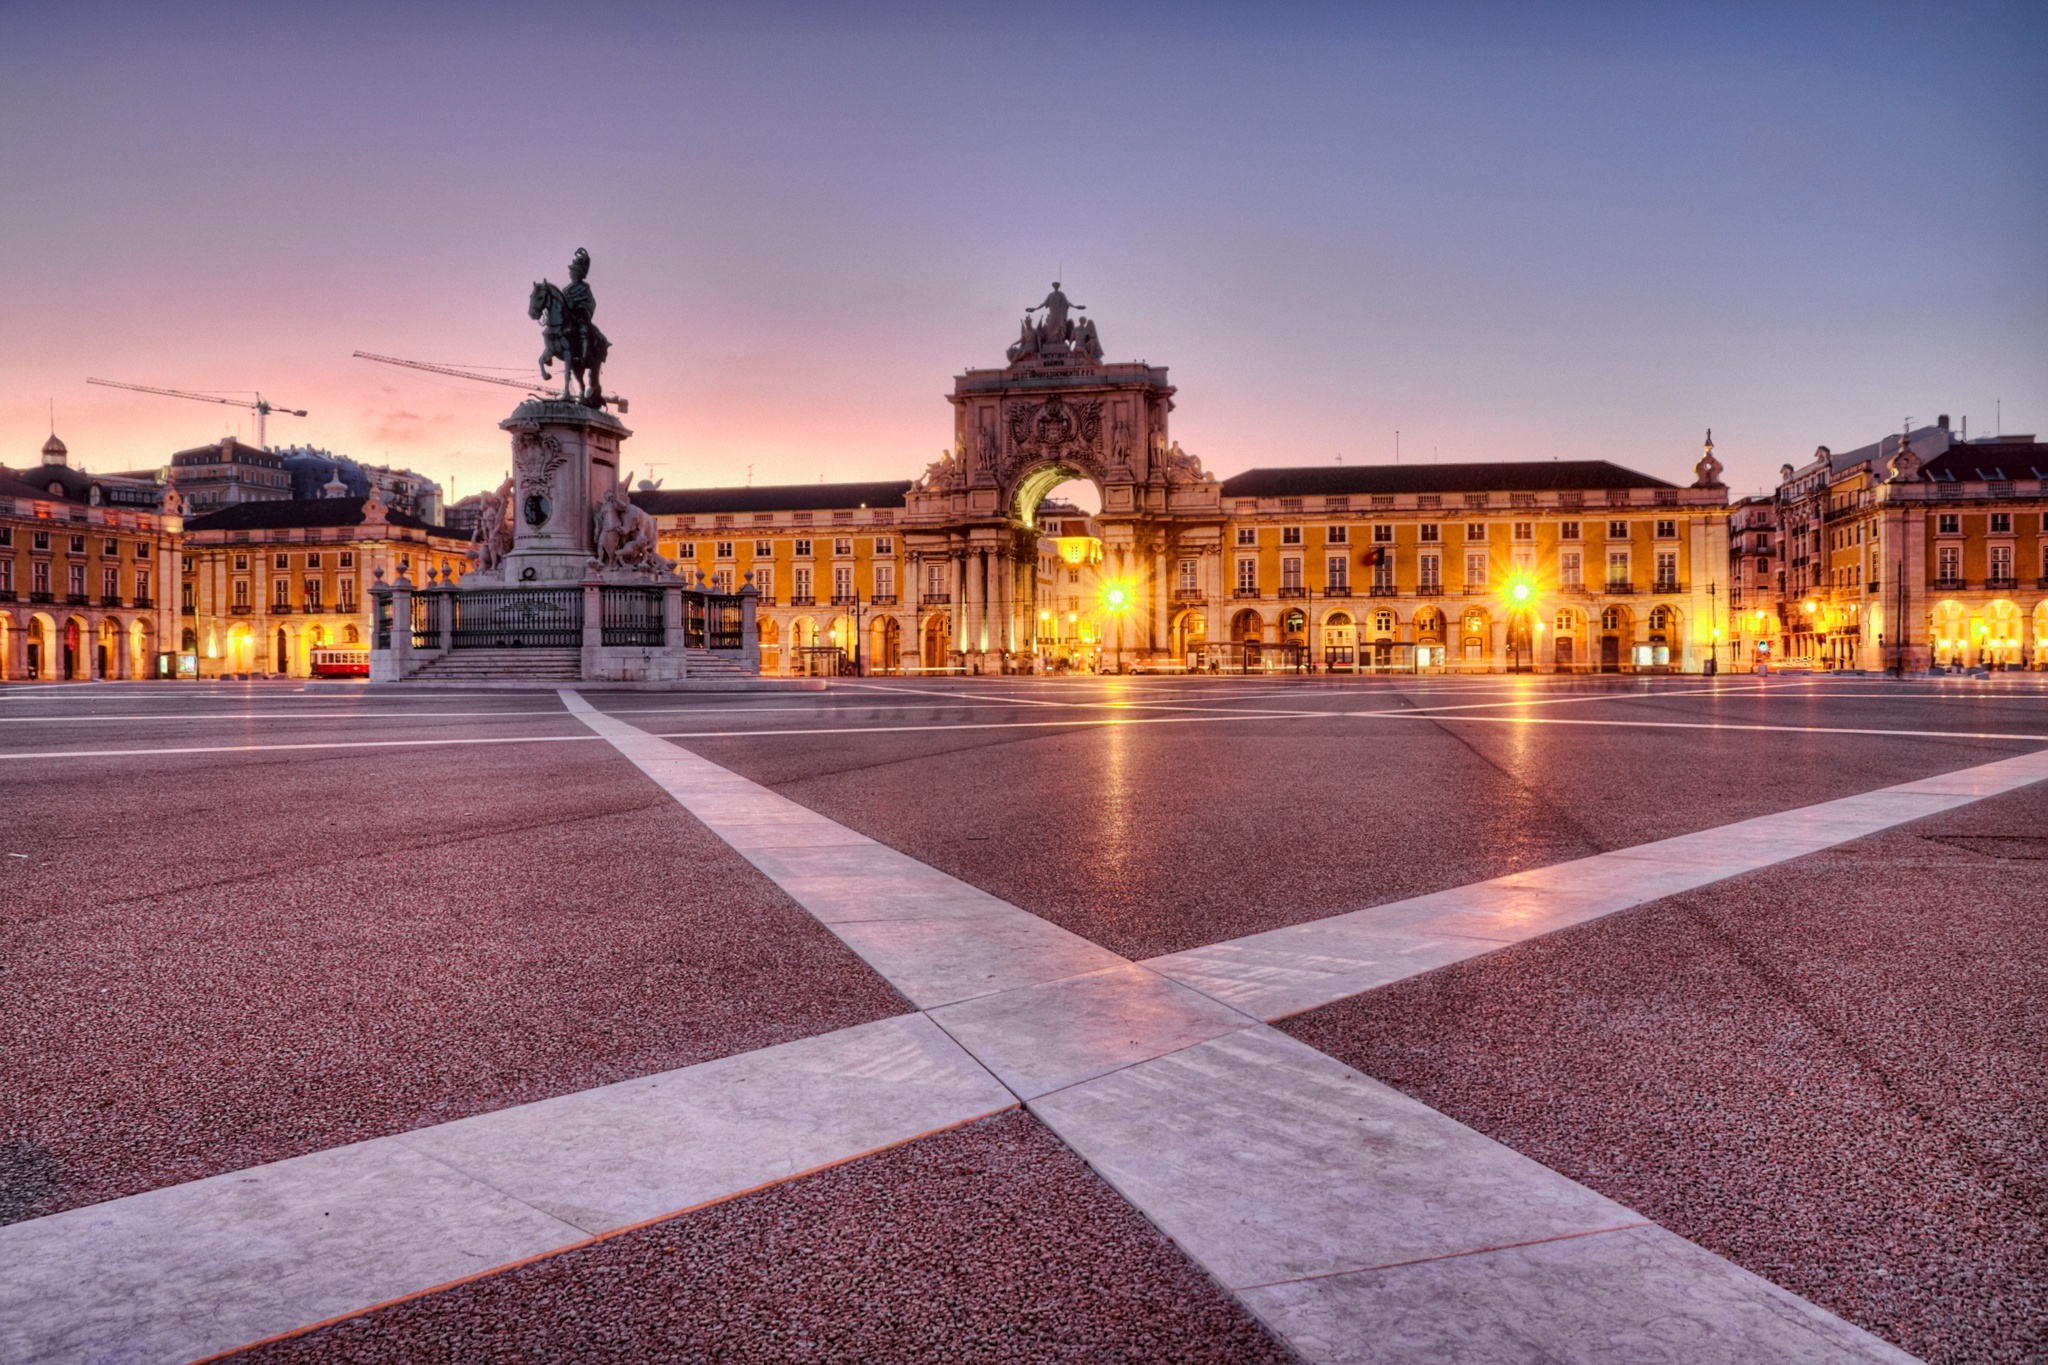 Praça-do-Comércio-in-Lisbon-109719368_2048x1365.jpeg